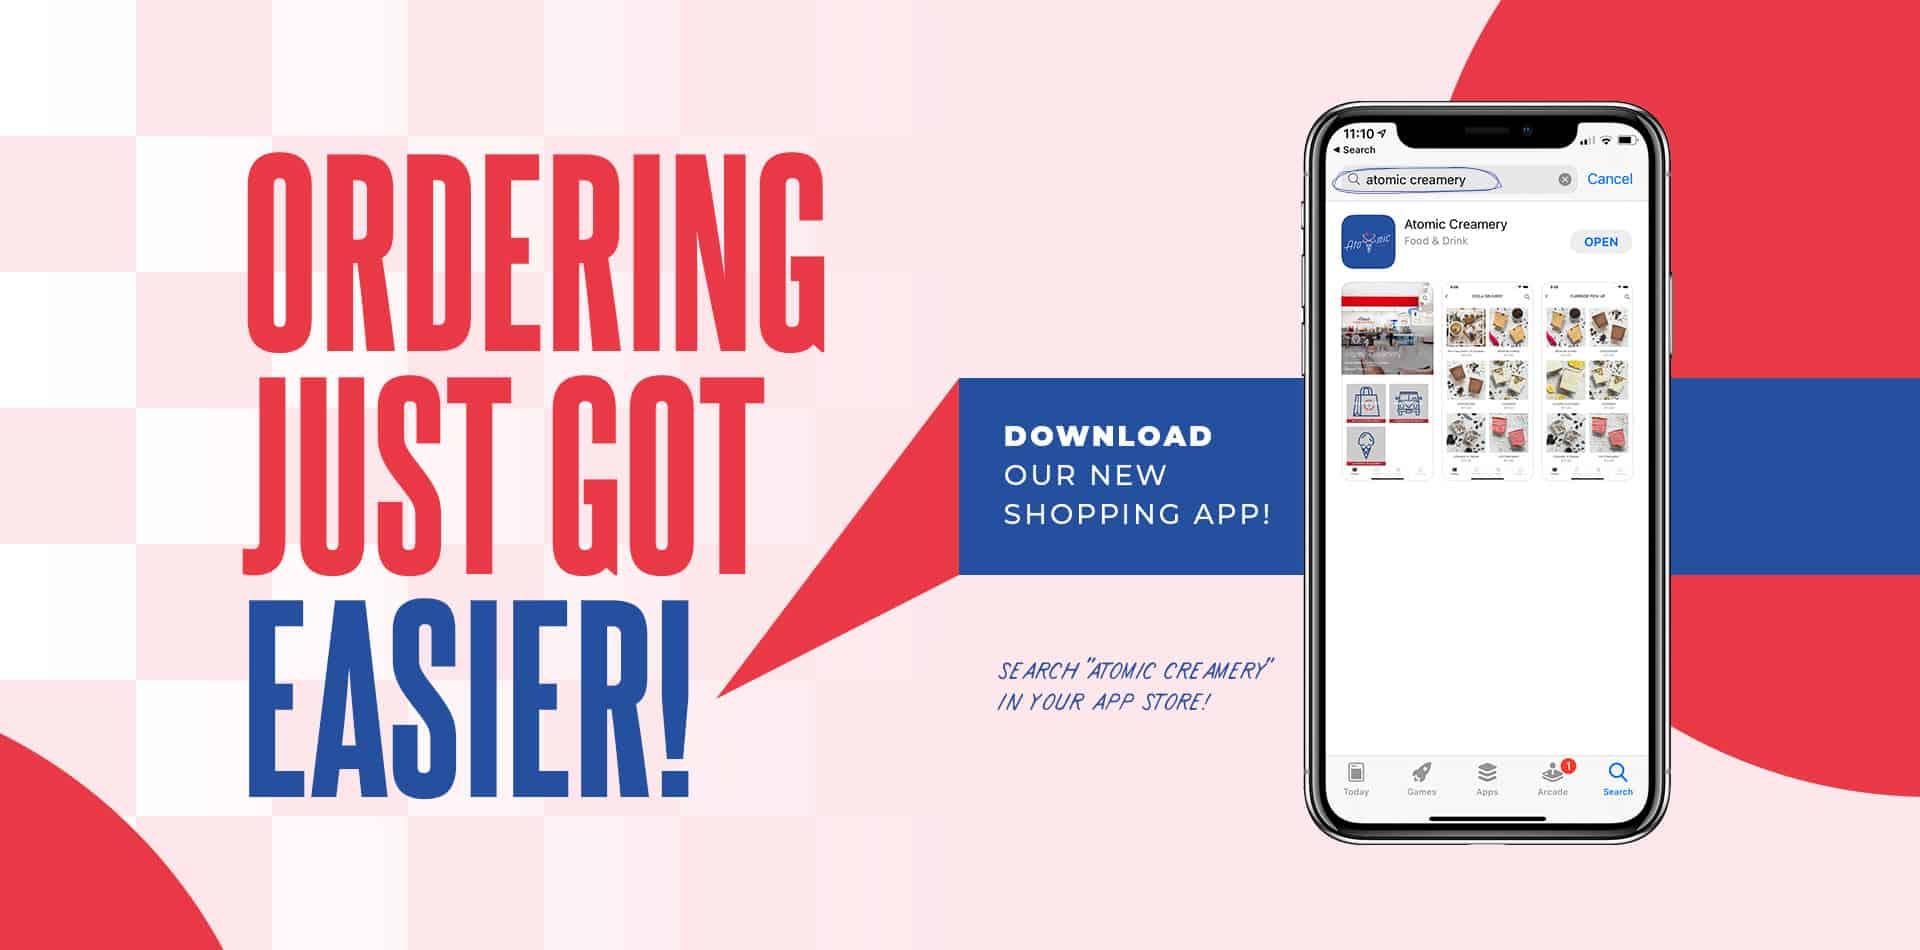 Atomic Creamery Mobile Shopping App